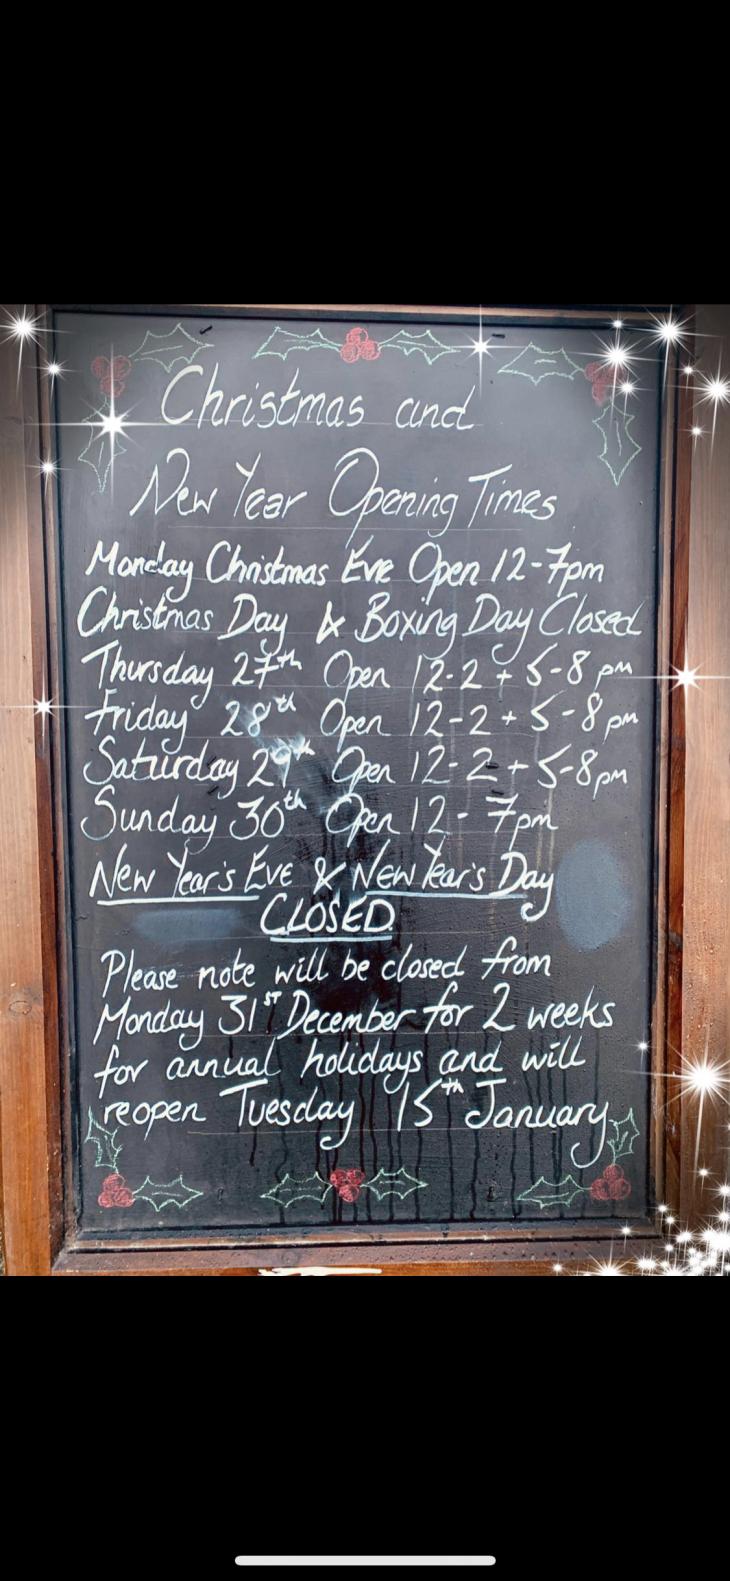 Opening Times Dec 2018 - Jan 2019